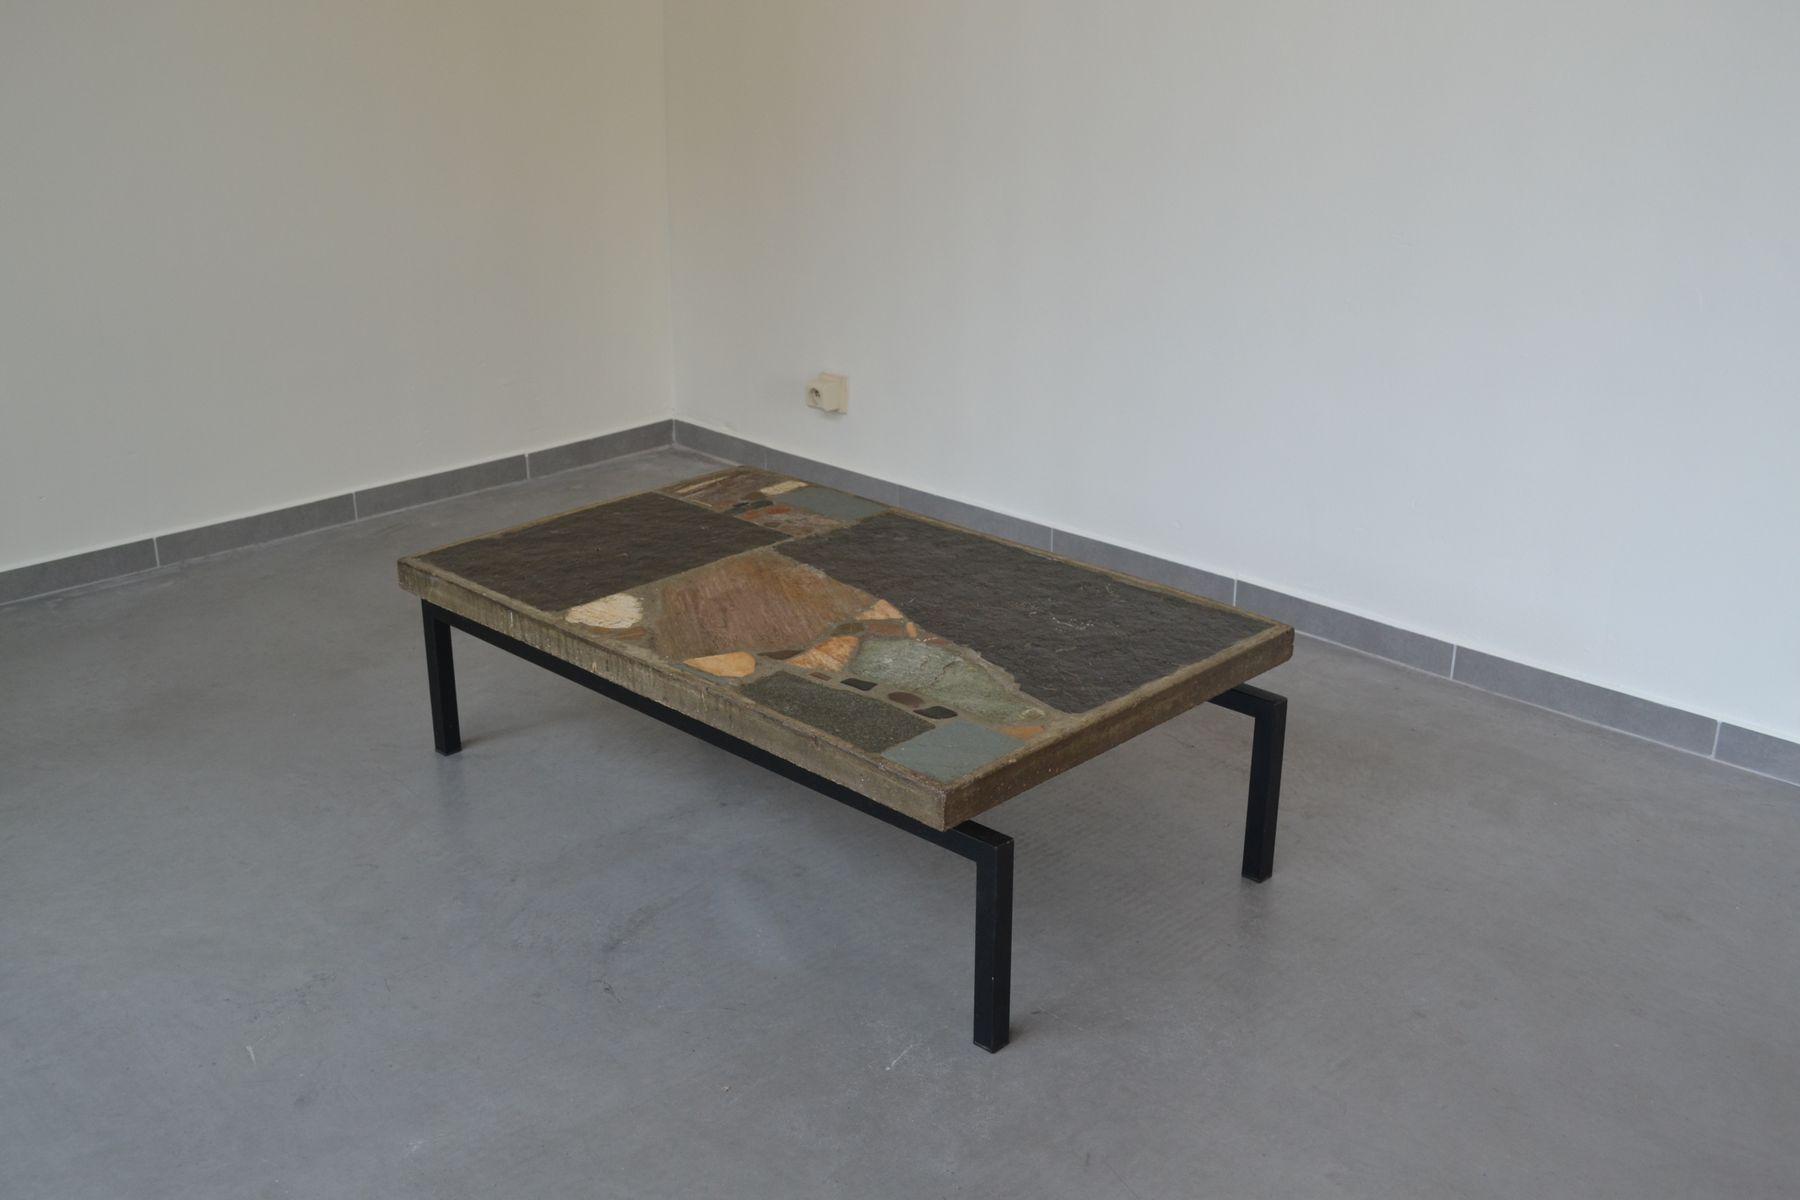 Slate Stone Coffee Table By Paul Kingma 1964 For Sale At Pamono